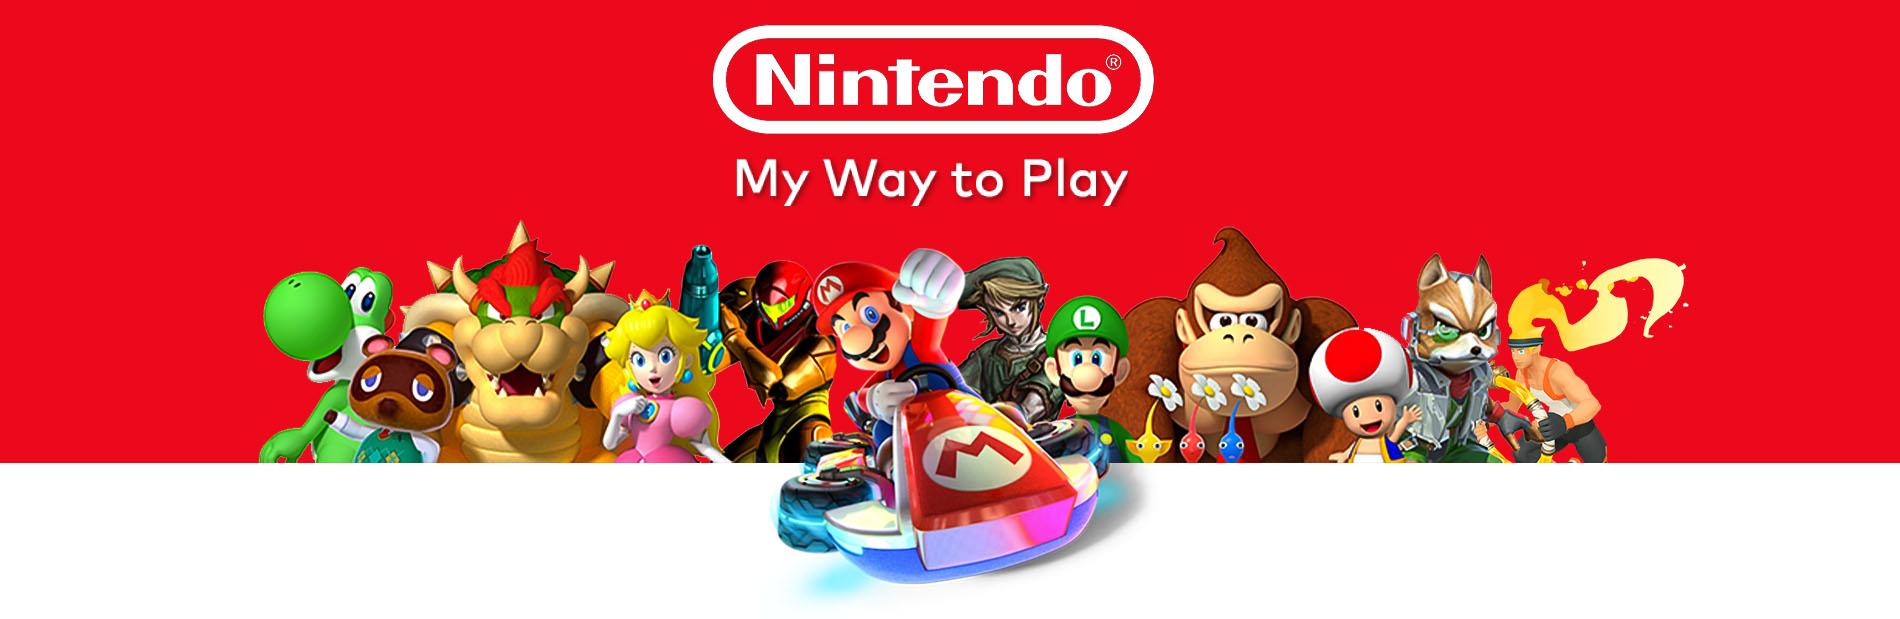 Nintendo Refresh Banner 2